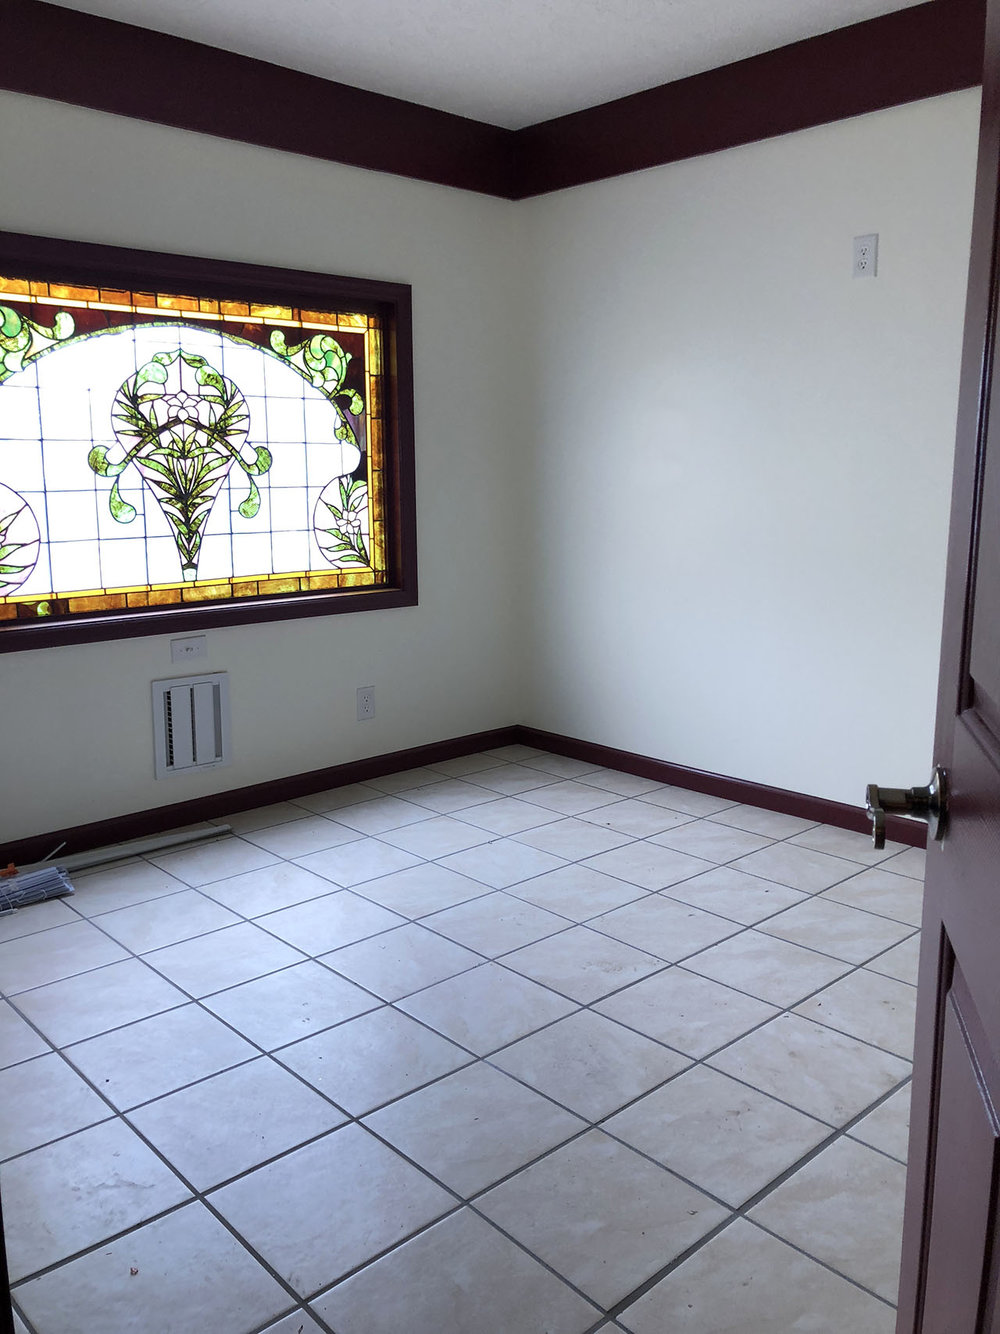 Room2_3.jpg